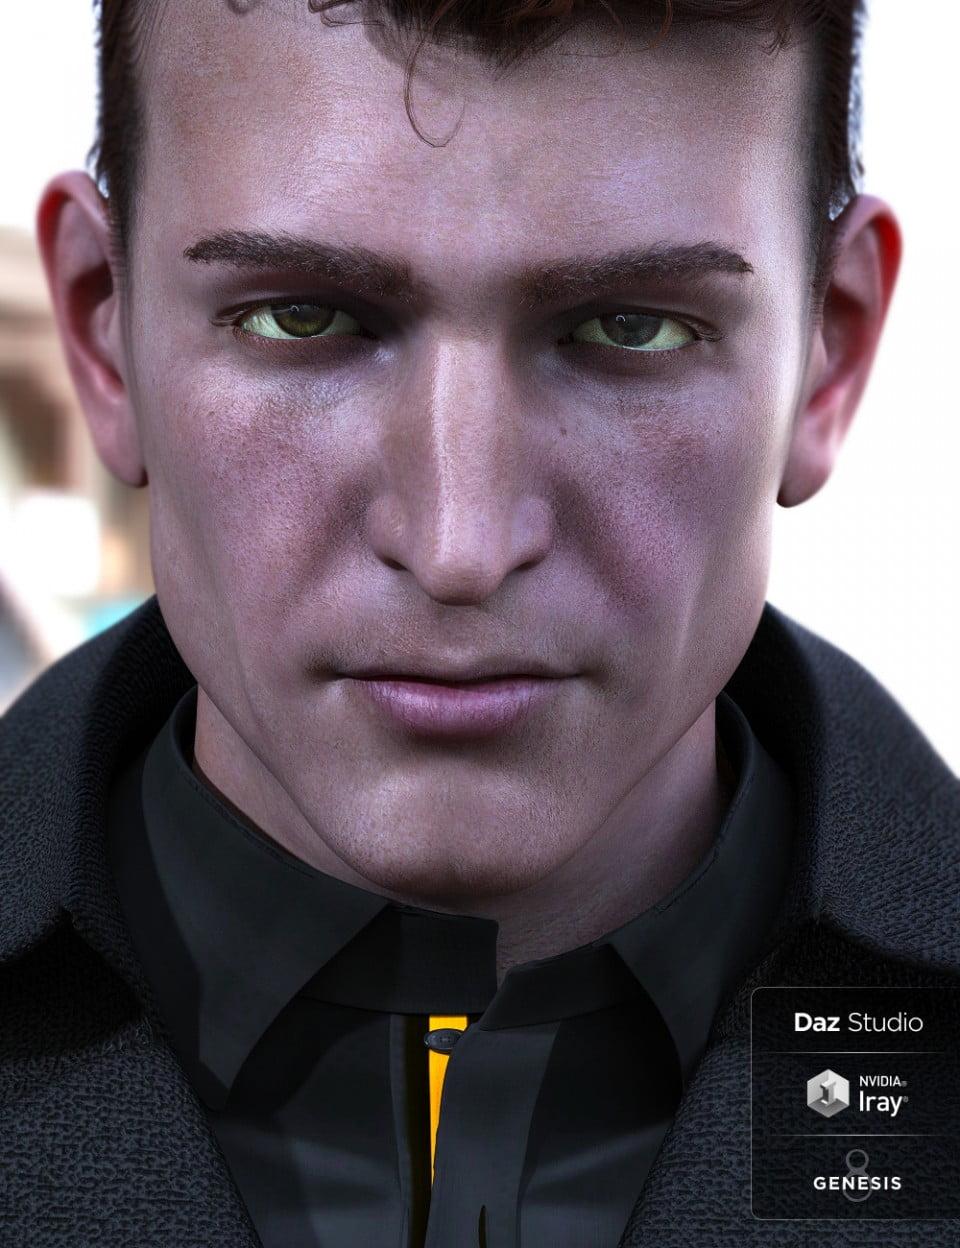 Liam for Edward 8 in Vendor, Darwins Mishap(s), 3D Models by Daz 3D